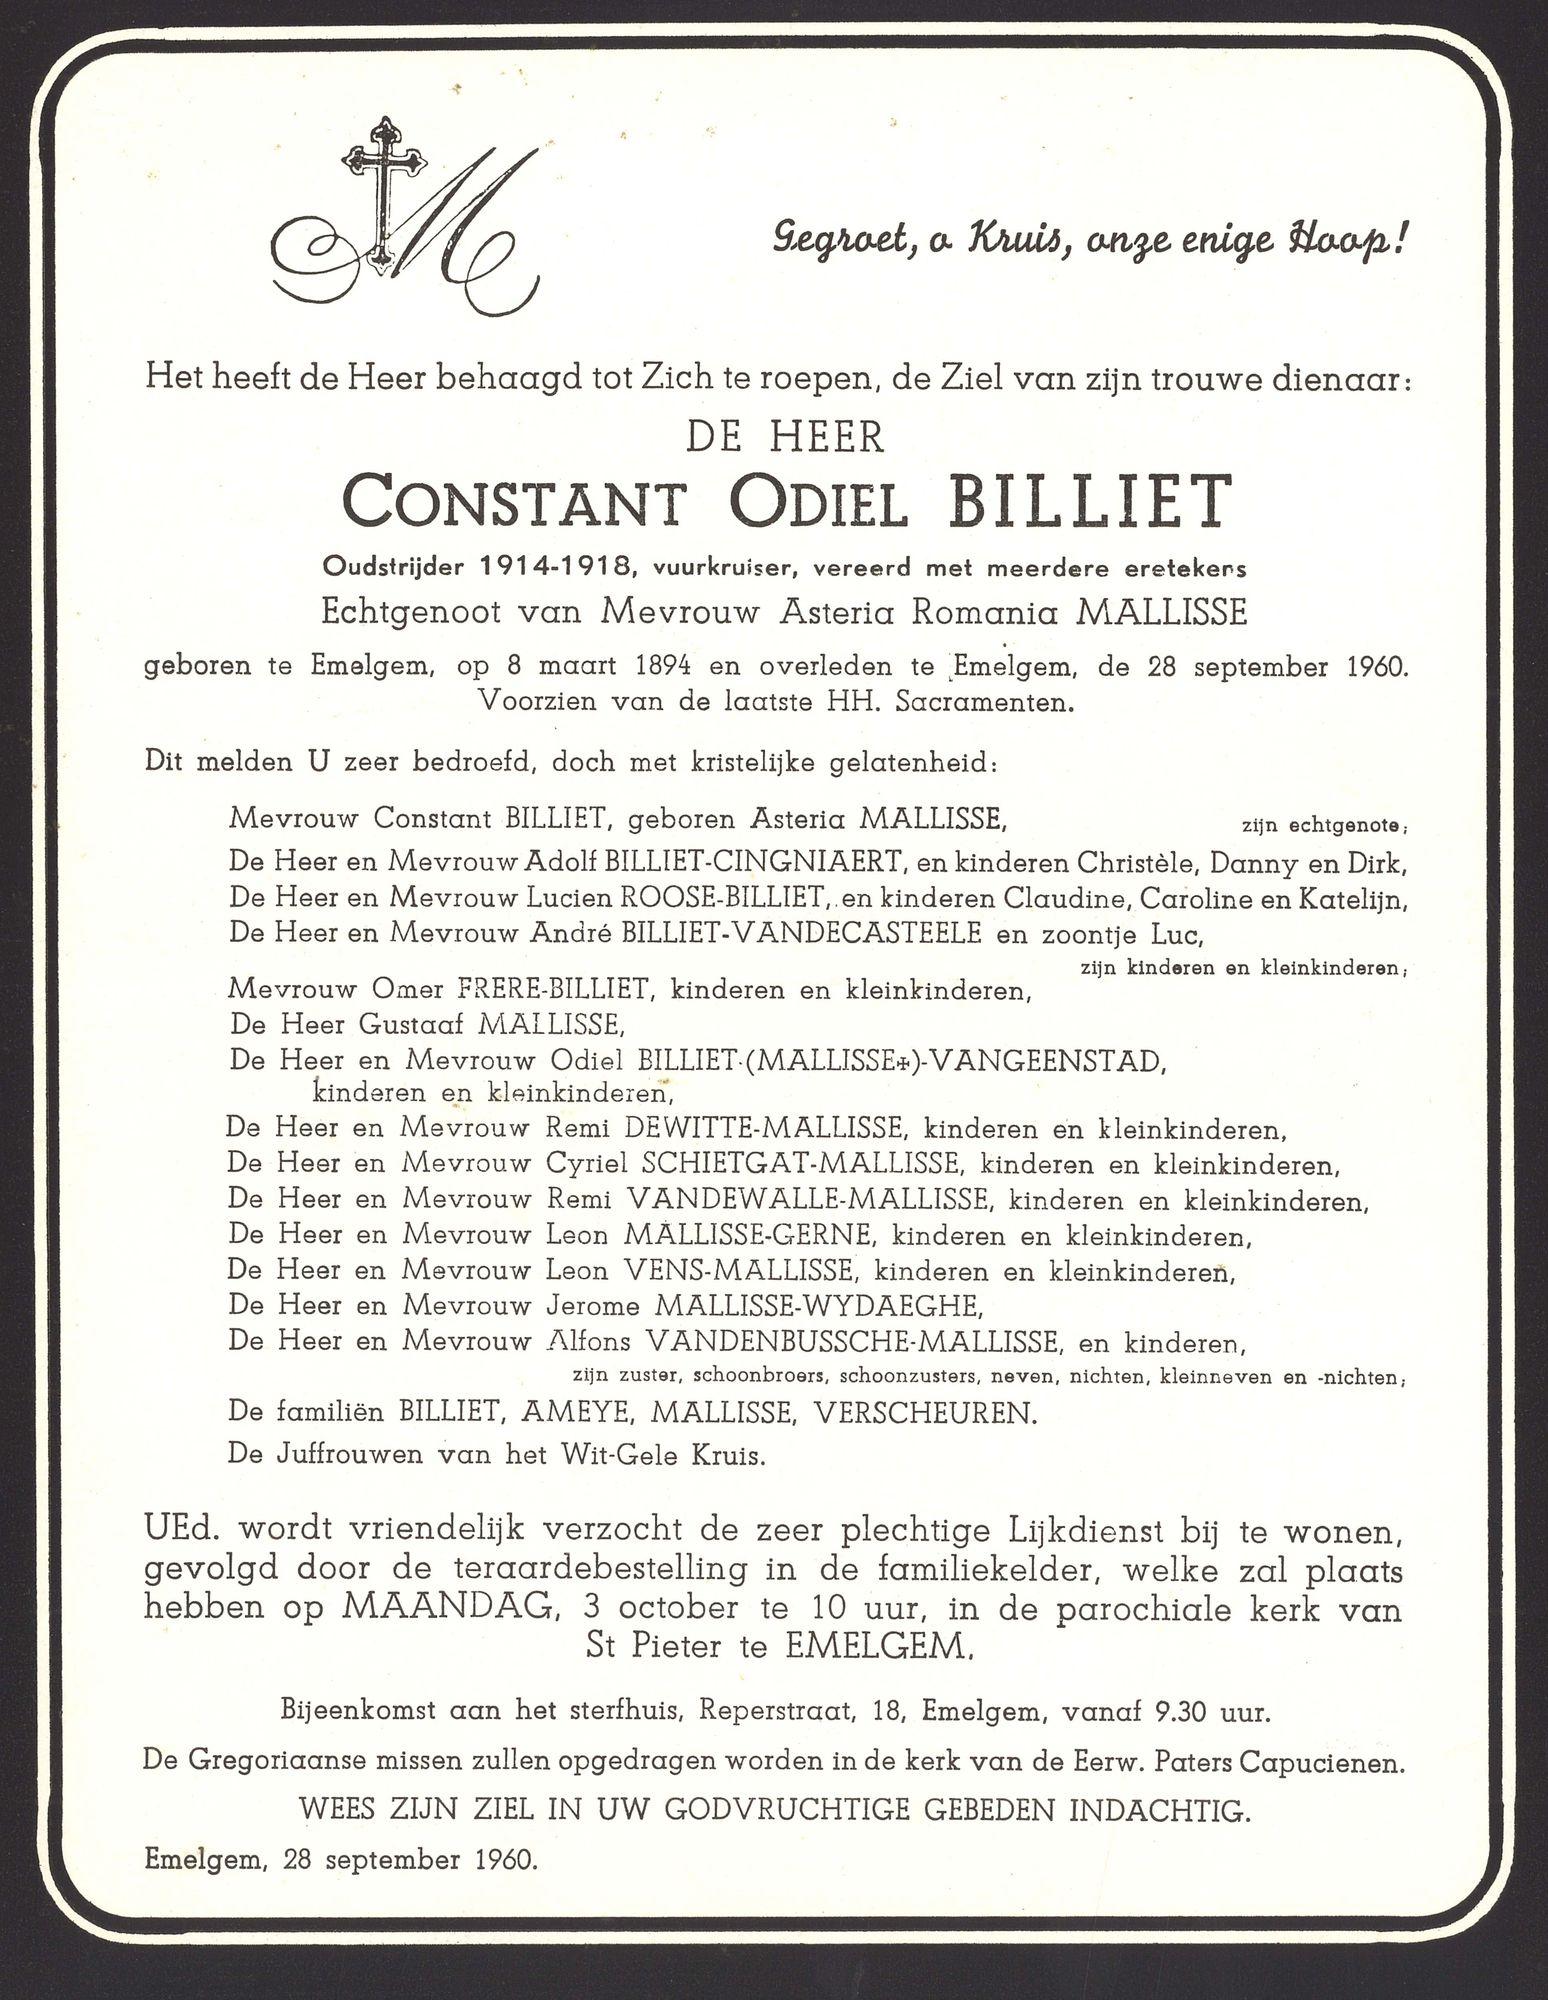 Billiet Constant Odiel